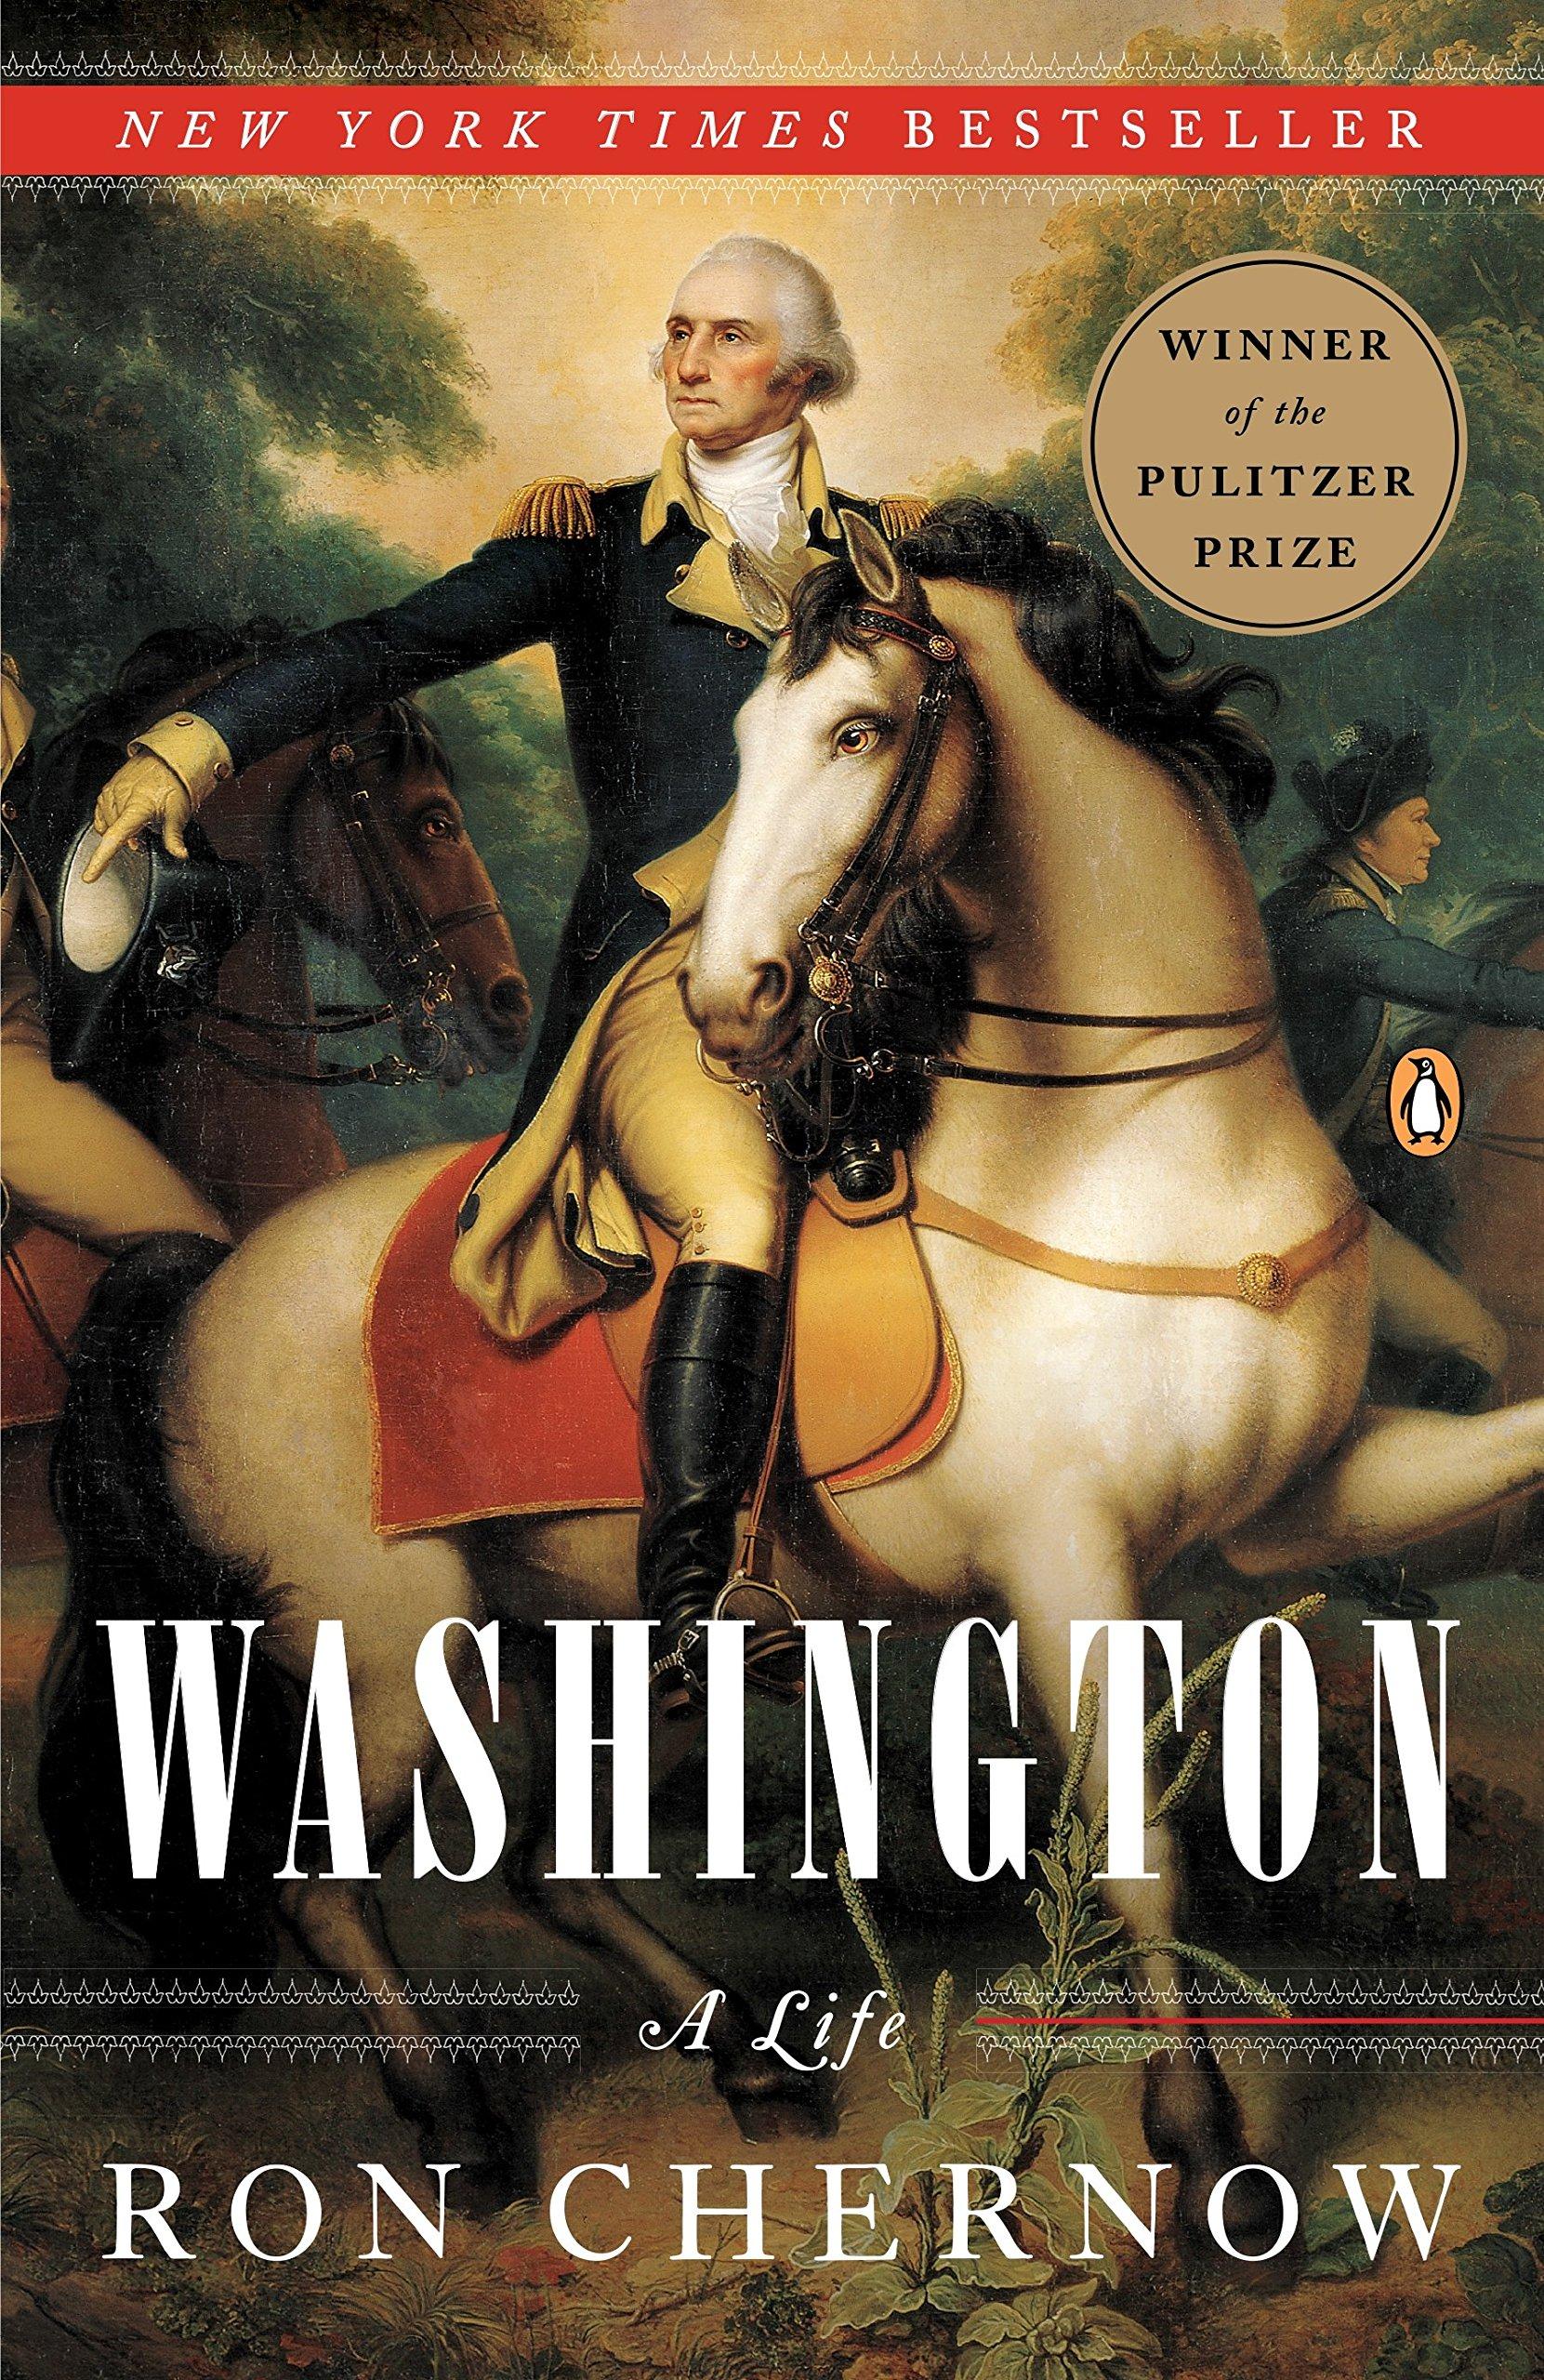 Washington: A Life ISBN-13 9780143119968